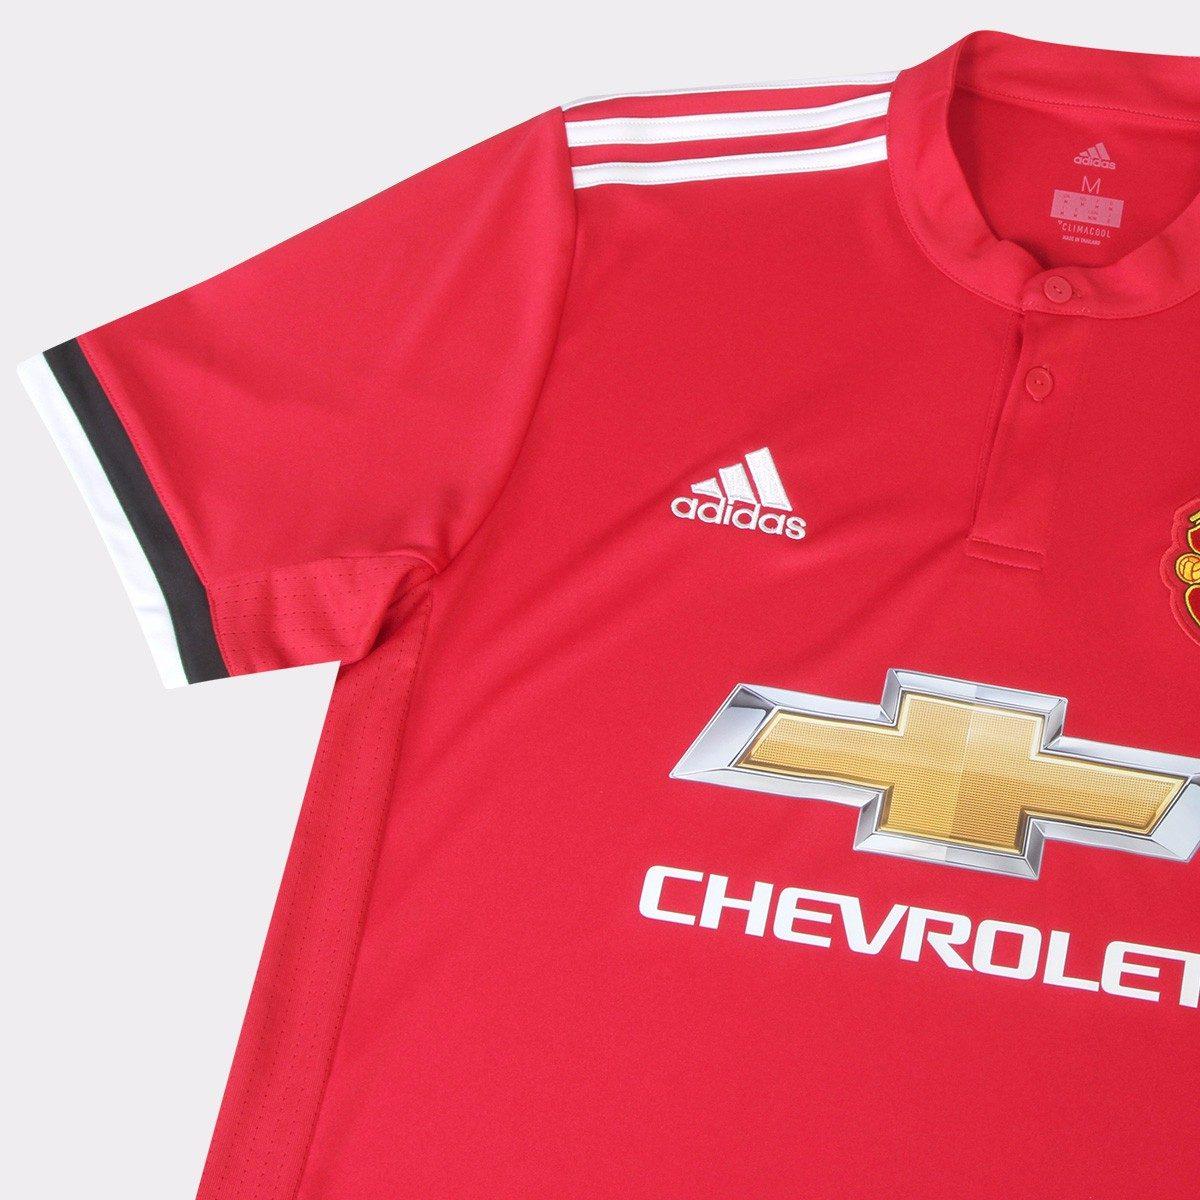 ea4f8036b Carregando zoom... manchester united camisa. Carregando zoom... camisa  manchester united adidas home 2017 2018 nº9 lukaku